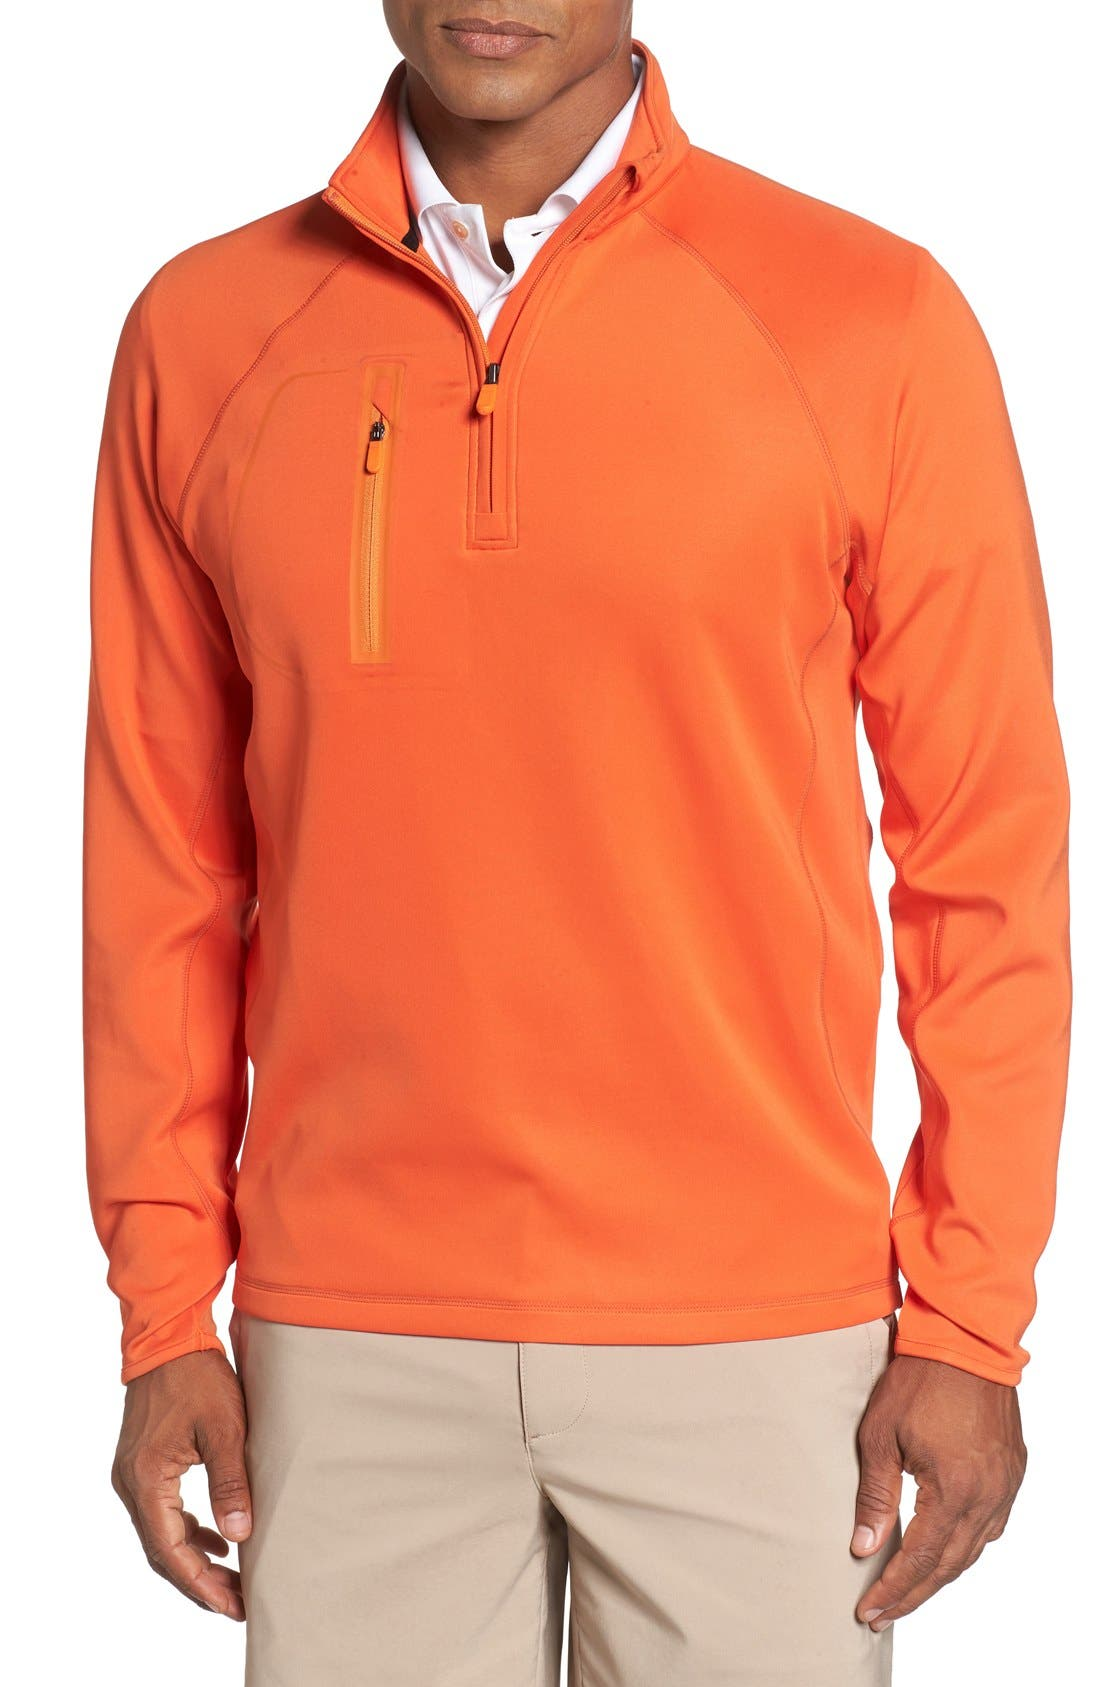 BOBBY JONES XH2O Crawford Stretch Quarter Zip Golf